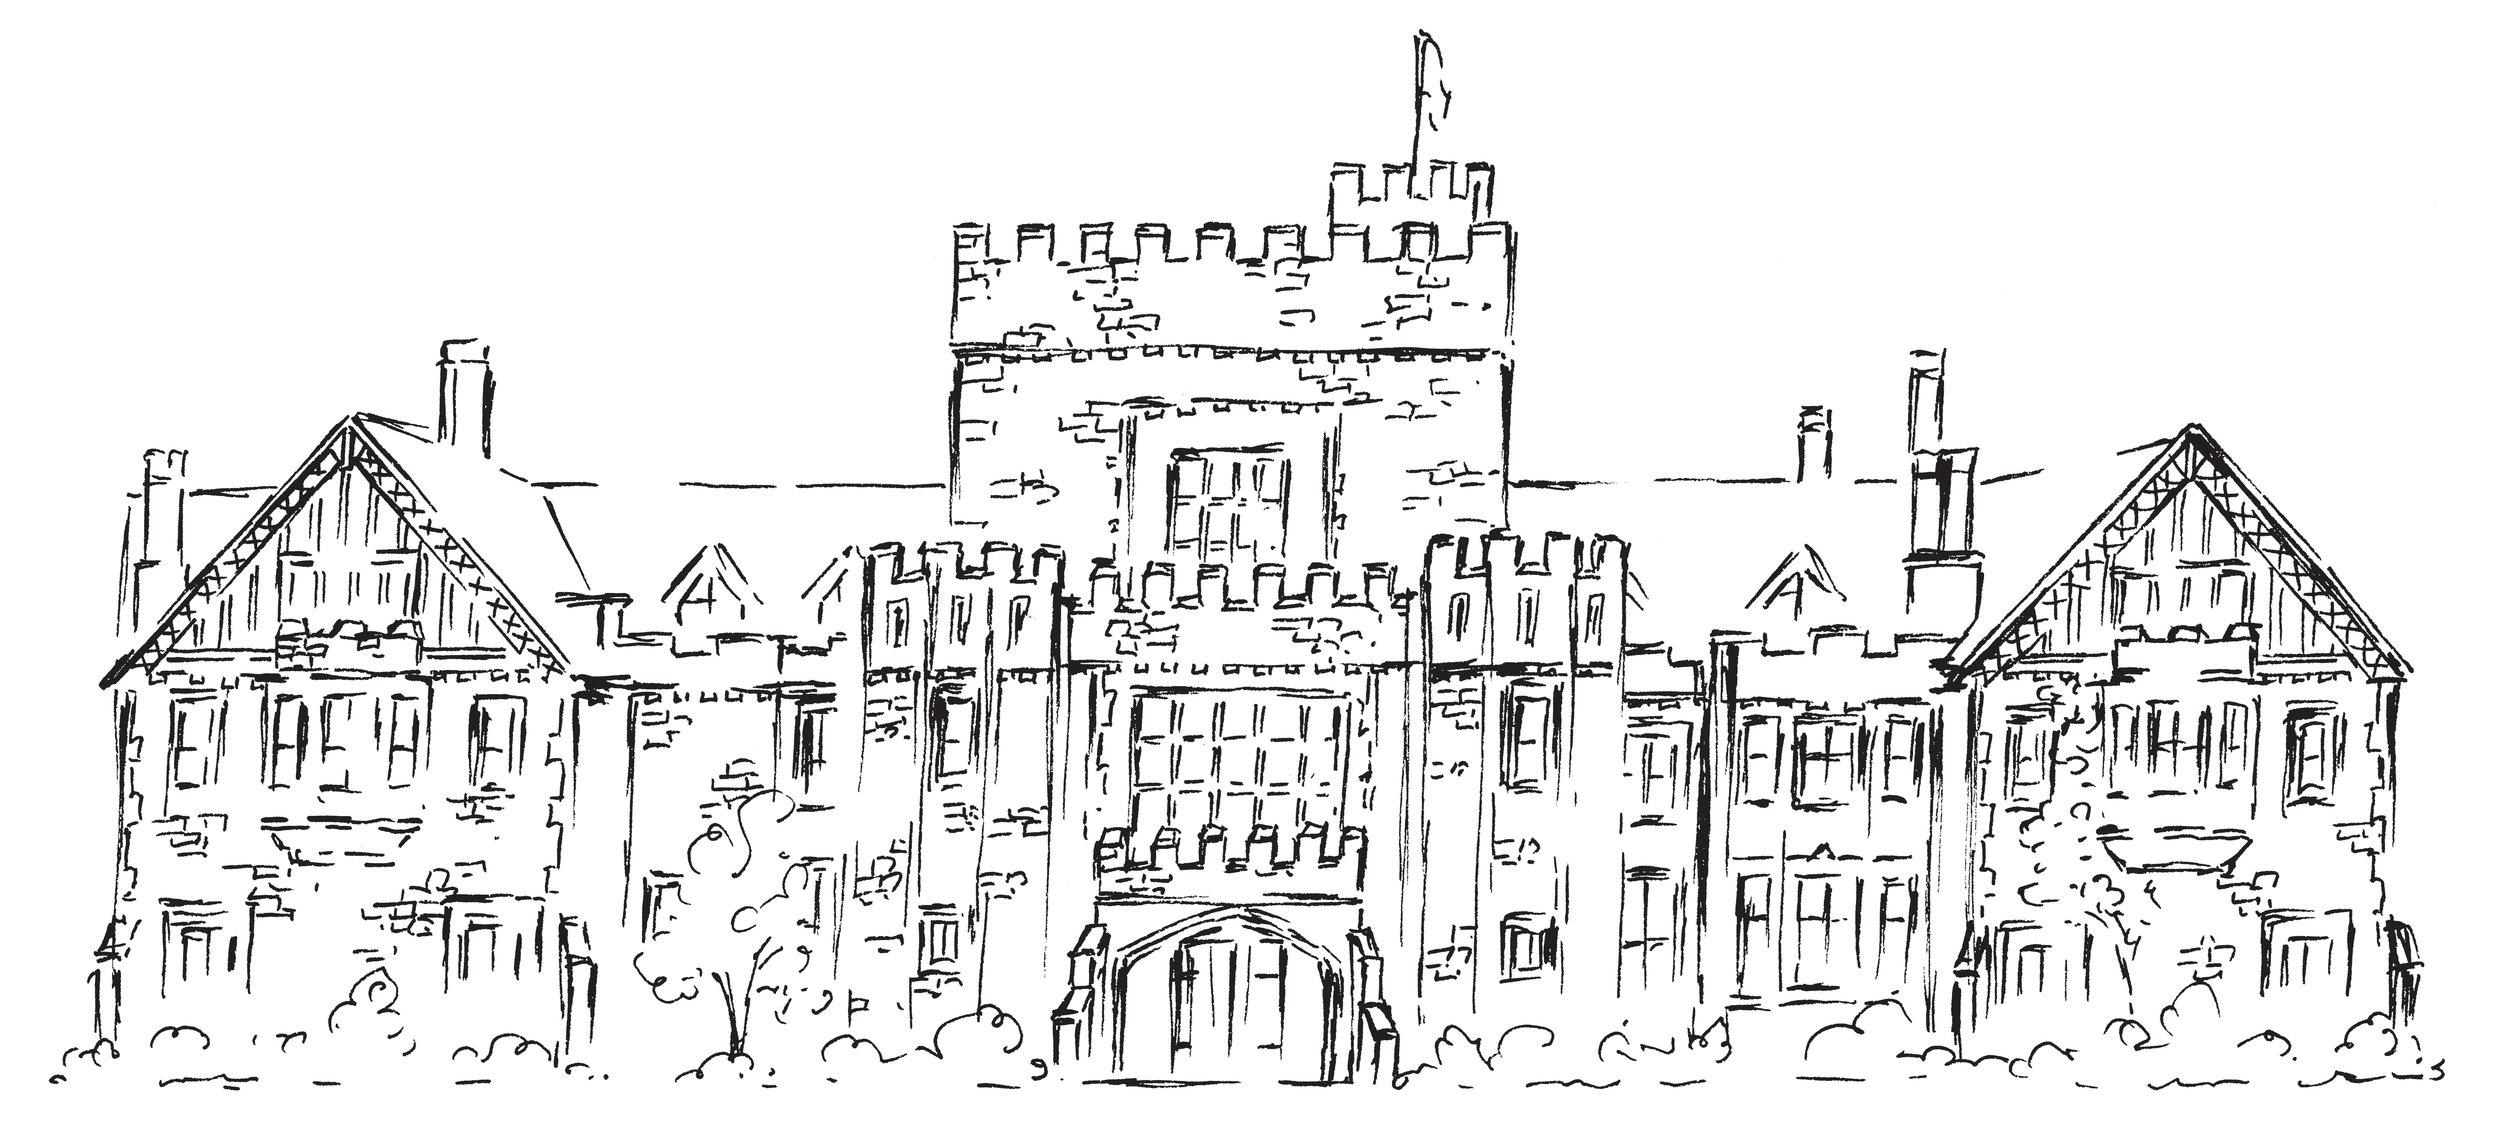 HatleyCastle_Illustration.jpg